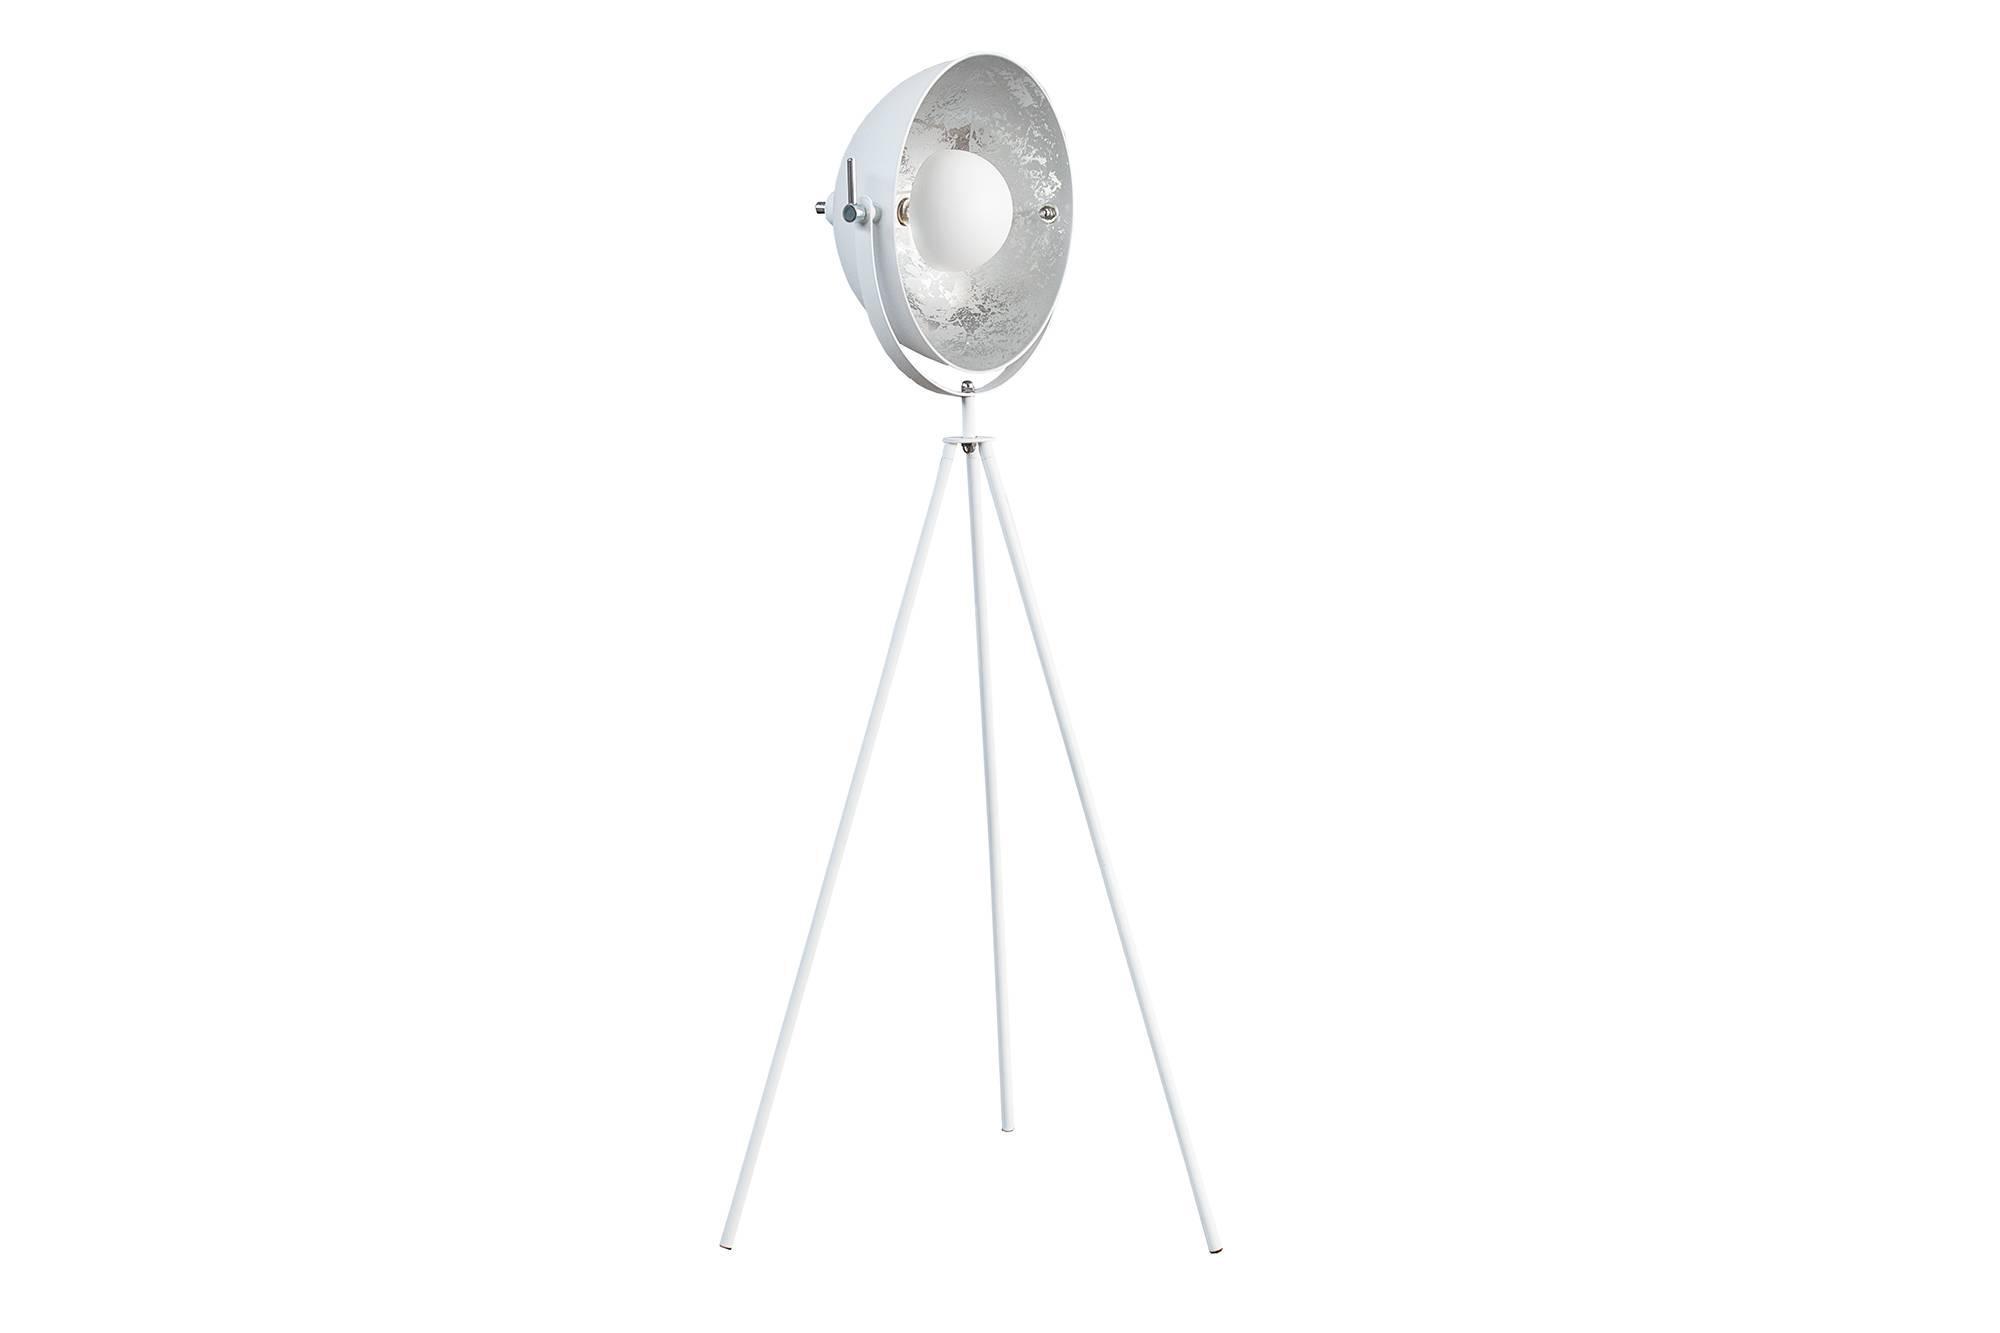 Stojanová lampa Atelier 140 BS